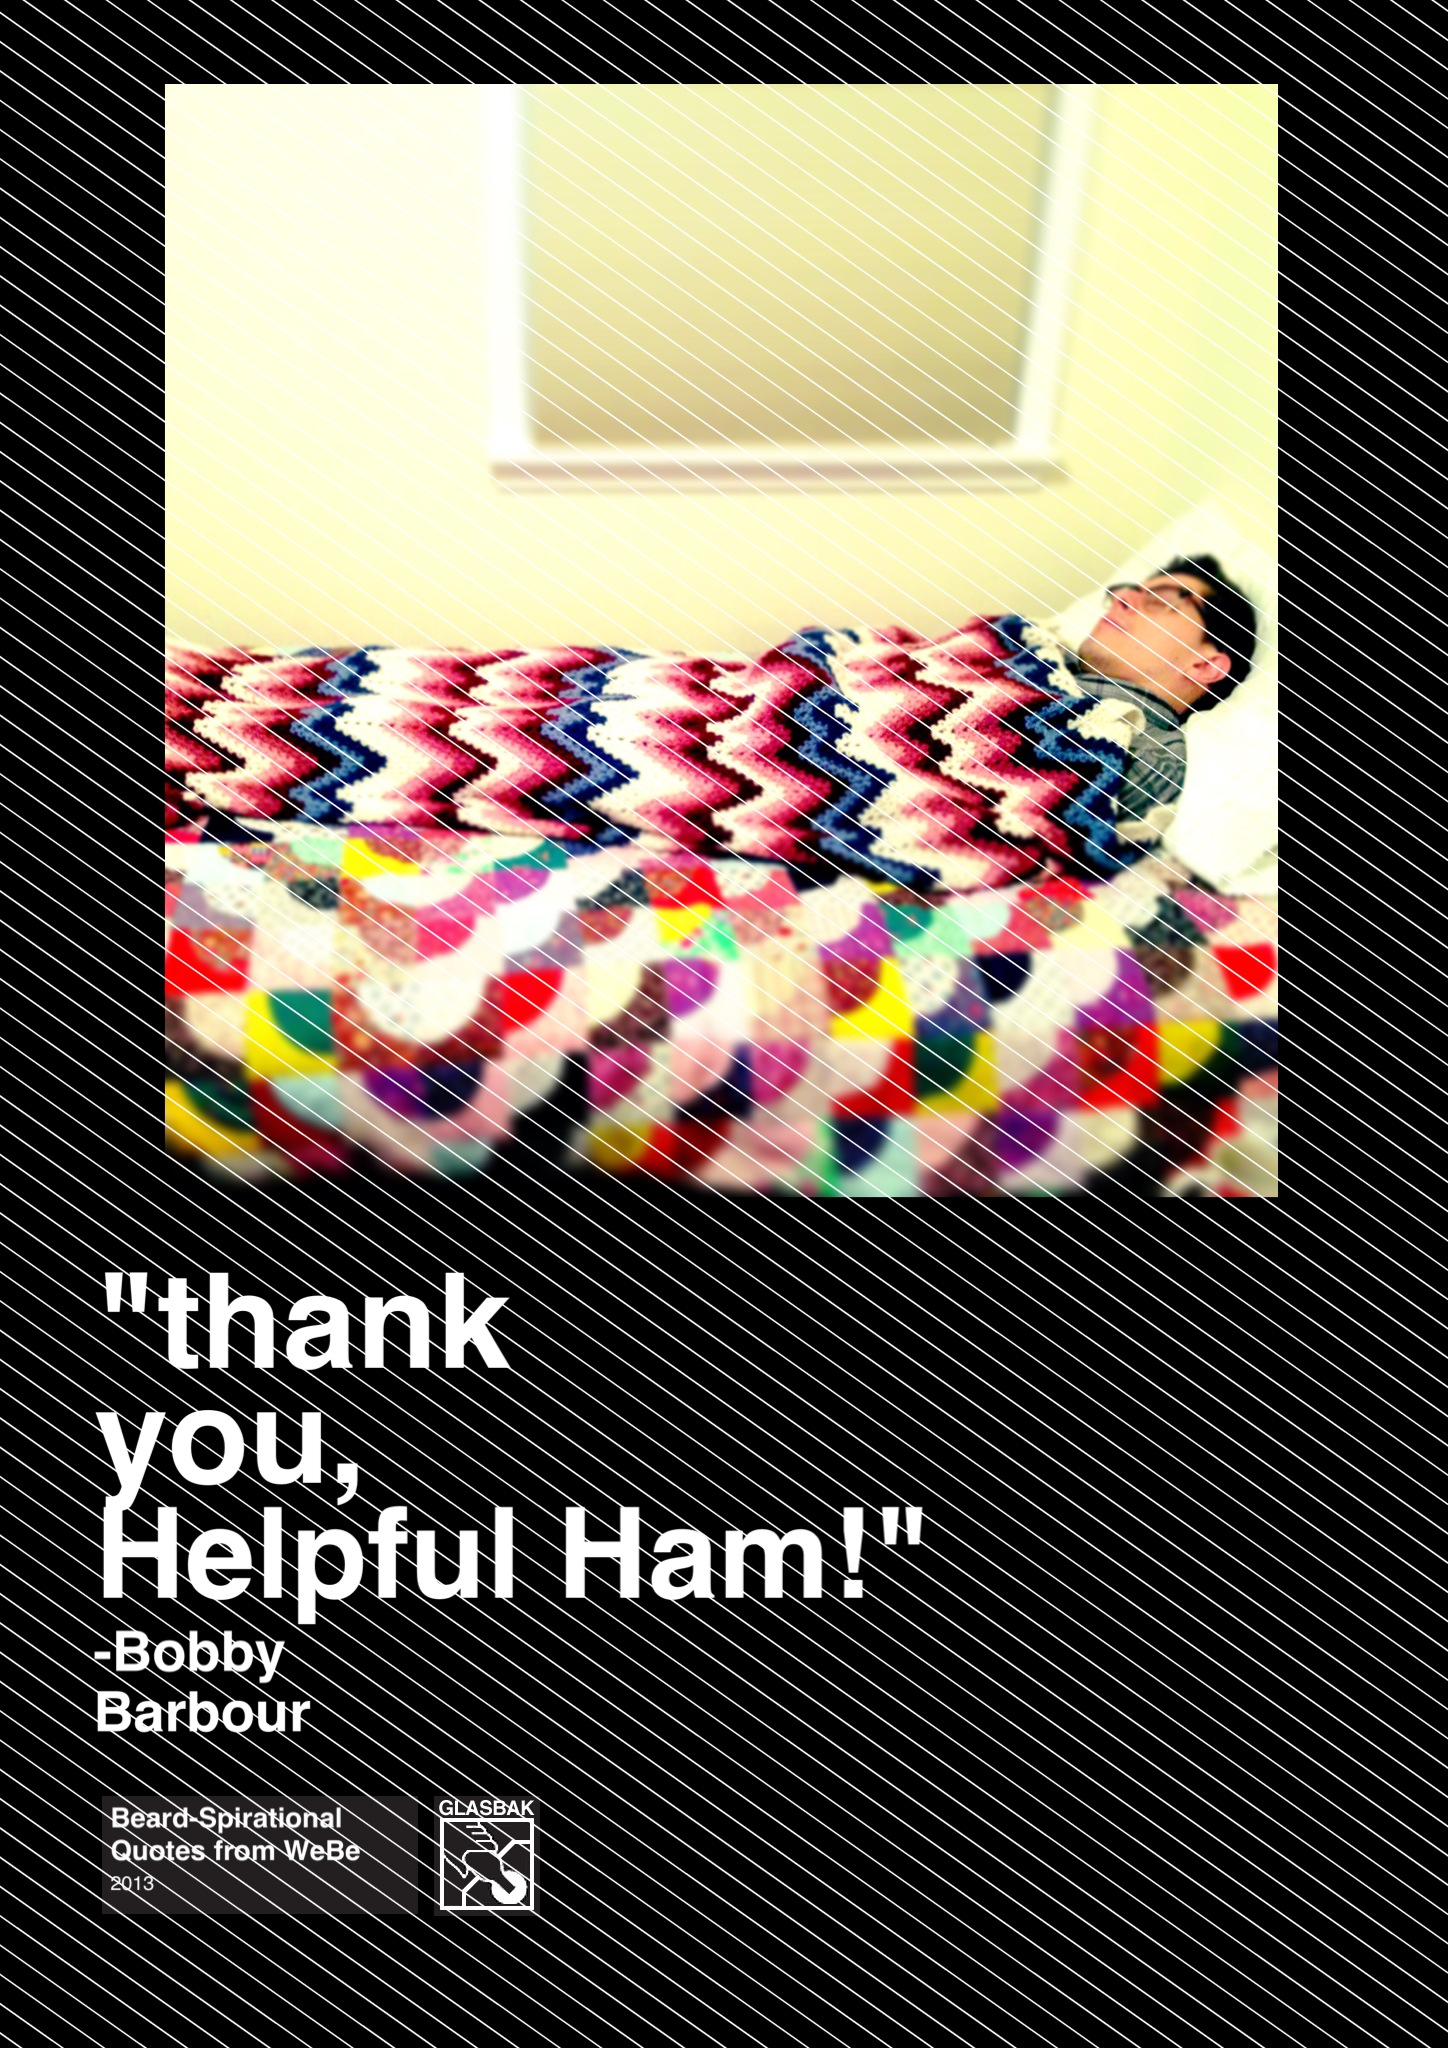 2013-03-11_thank you, Helpful Ham!.jpg